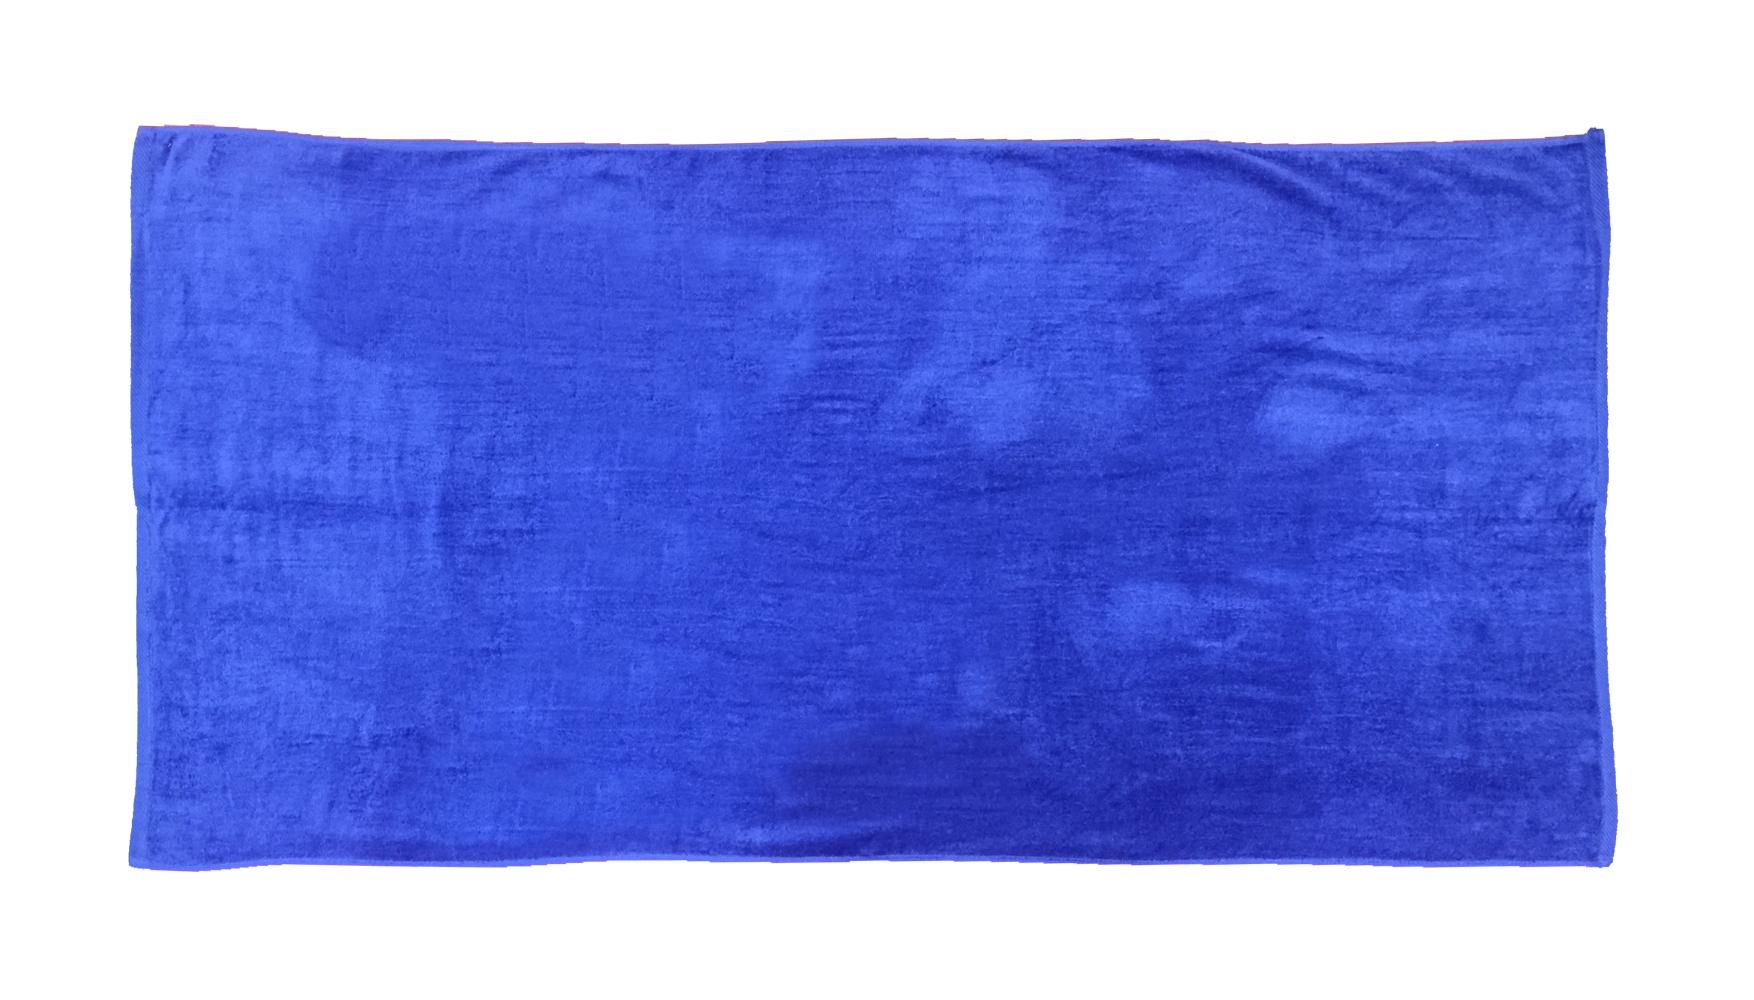 Towelsoutlet Com 30x60 Terry Beach Towels 100 Cotton